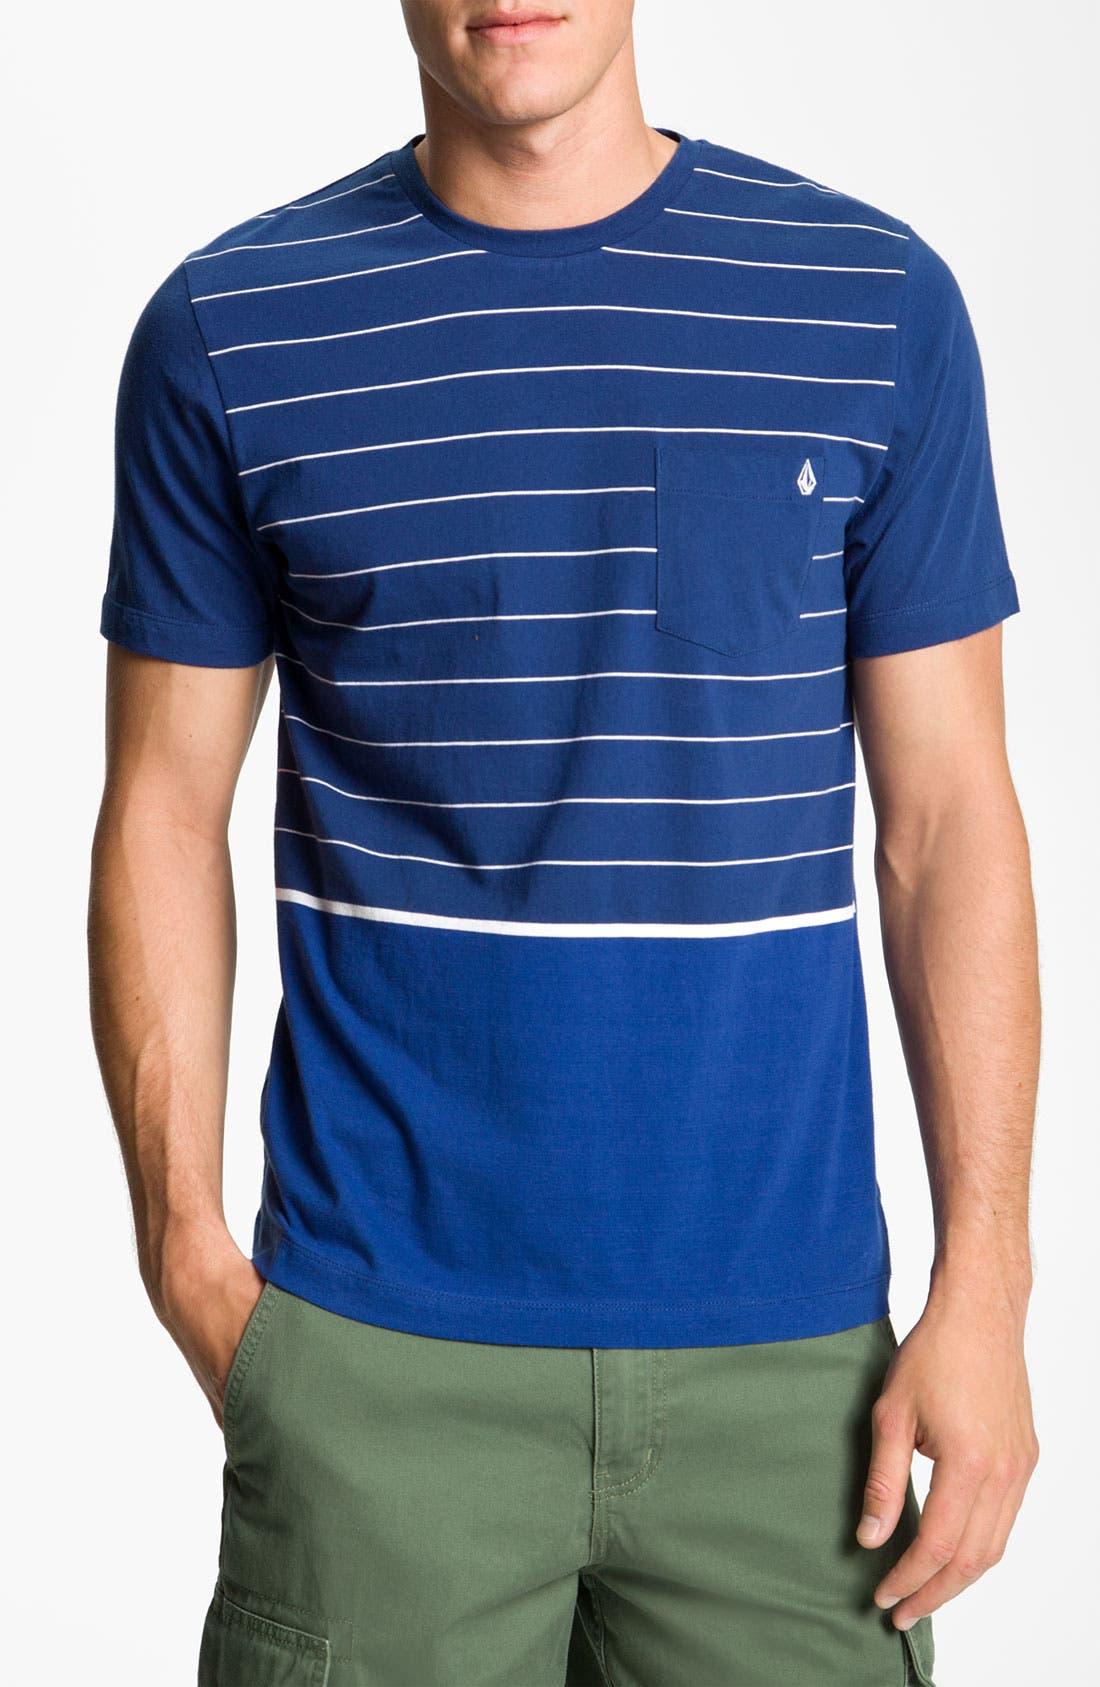 Main Image - Volcom 'Primer' Stripe Print Organic Cotton T-Shirt